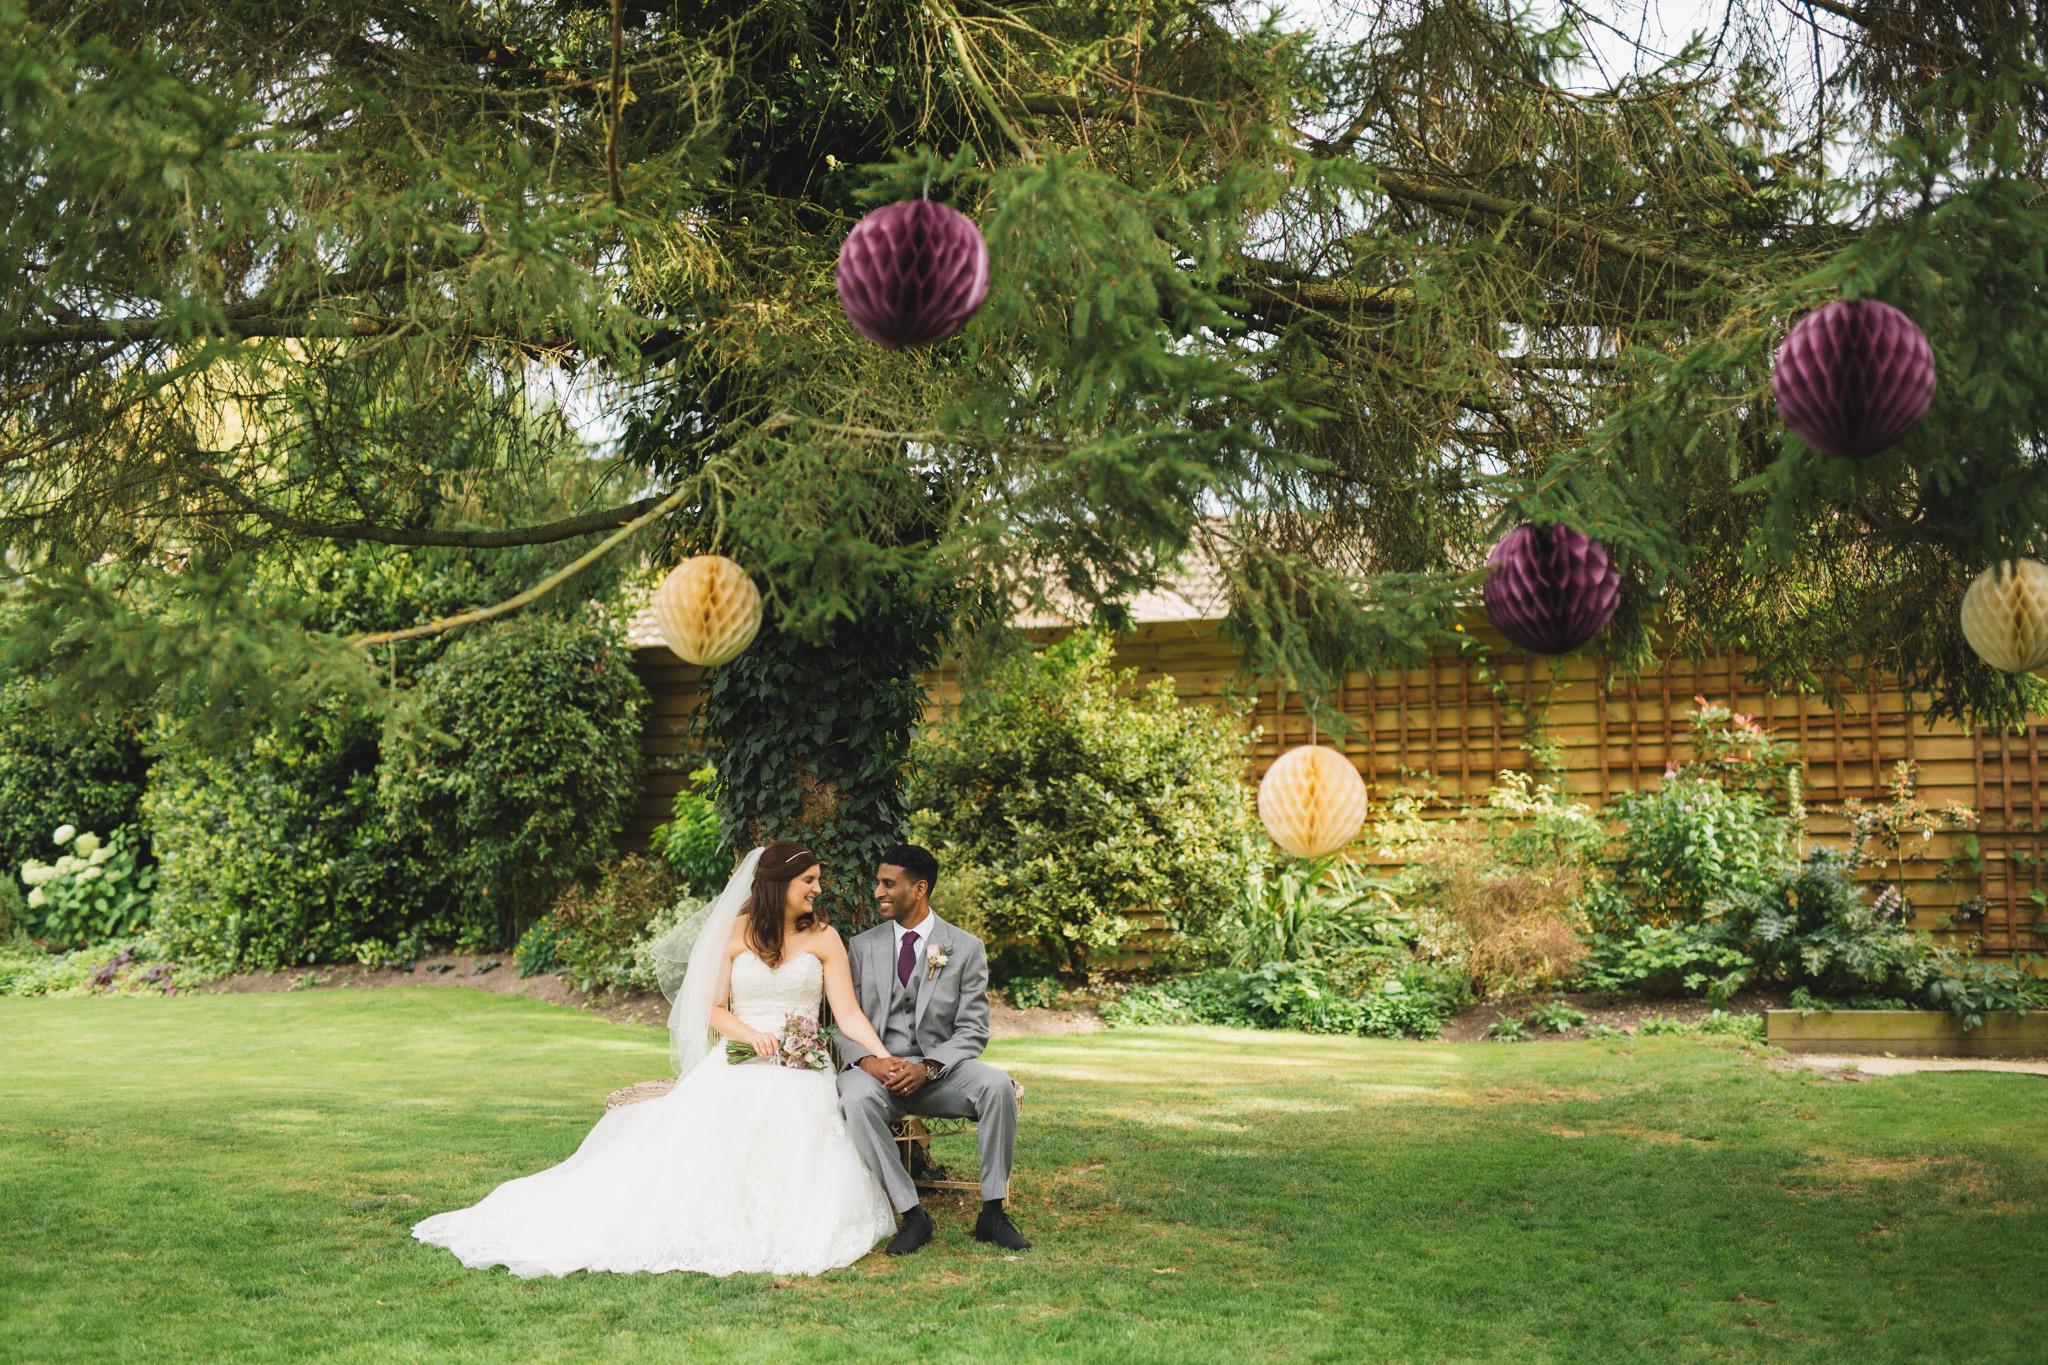 cat-lane-weddings__sheene-mill-wedding-photography__clw__1556__C5A9631.jpg